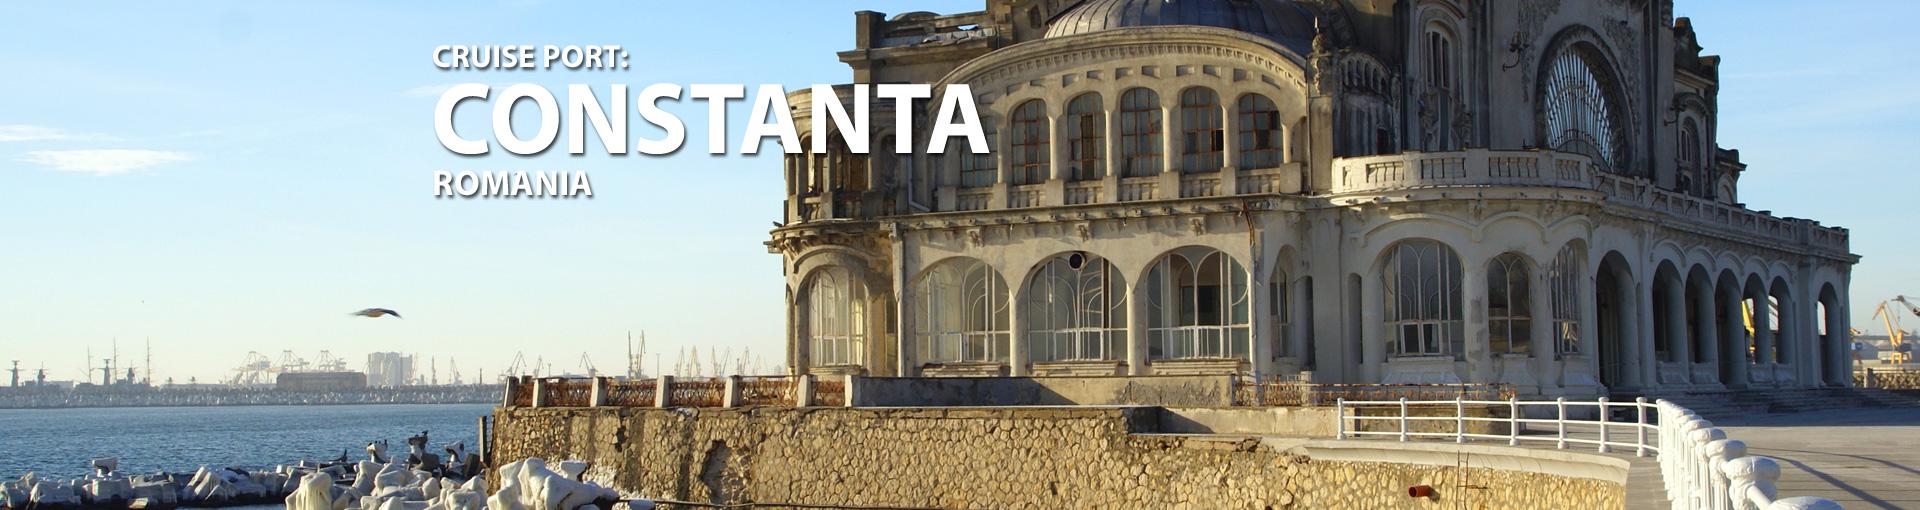 Cruises to Constanta, Romania